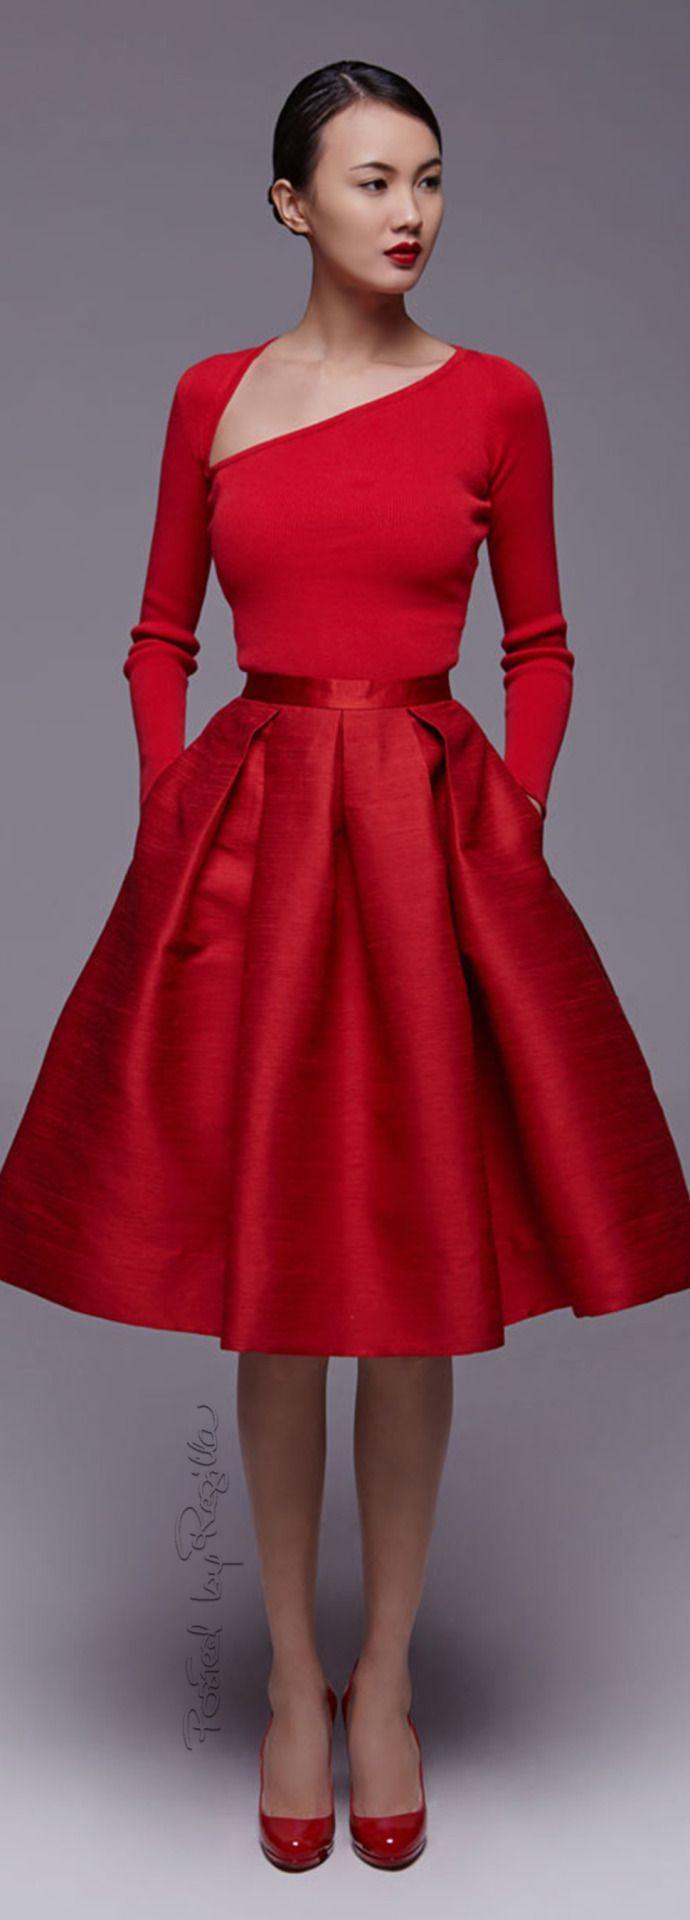 Regilla Red Cocktail Dress Red Dress Red Fashion [ 1920 x 690 Pixel ]